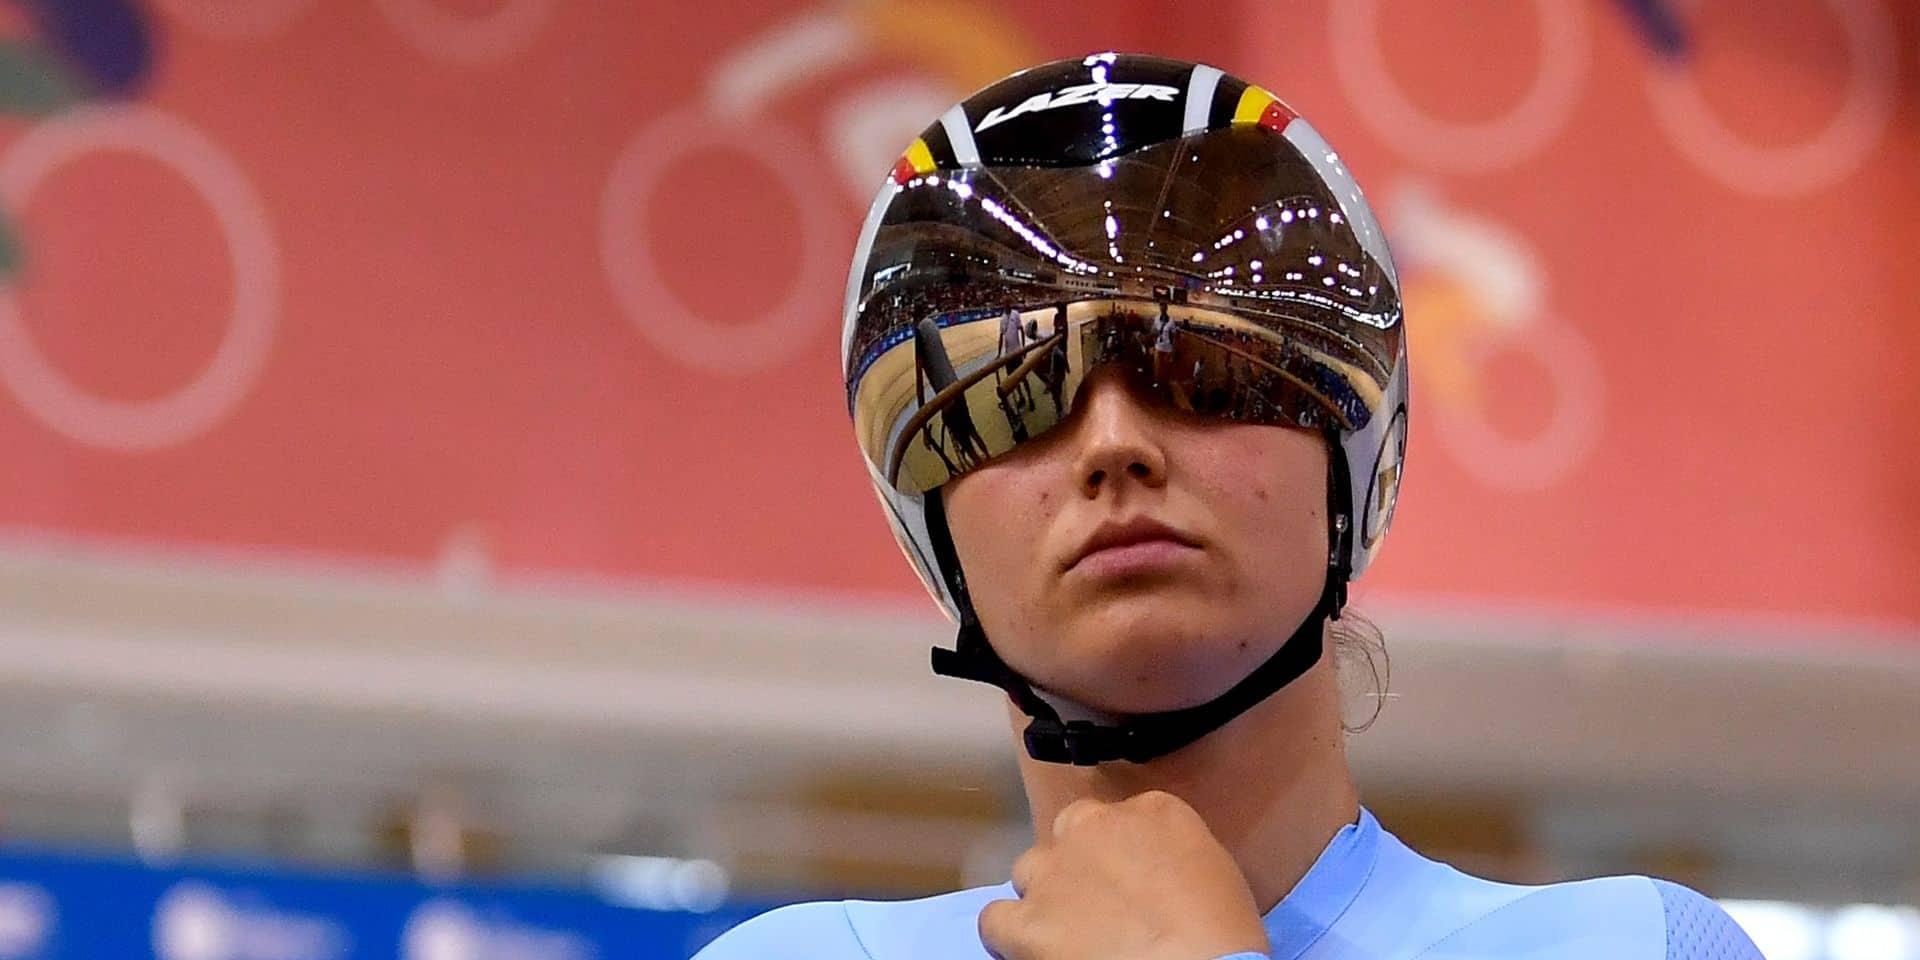 Jeux Européens: Nicky Degrendele en huitièmes de finale du sprint